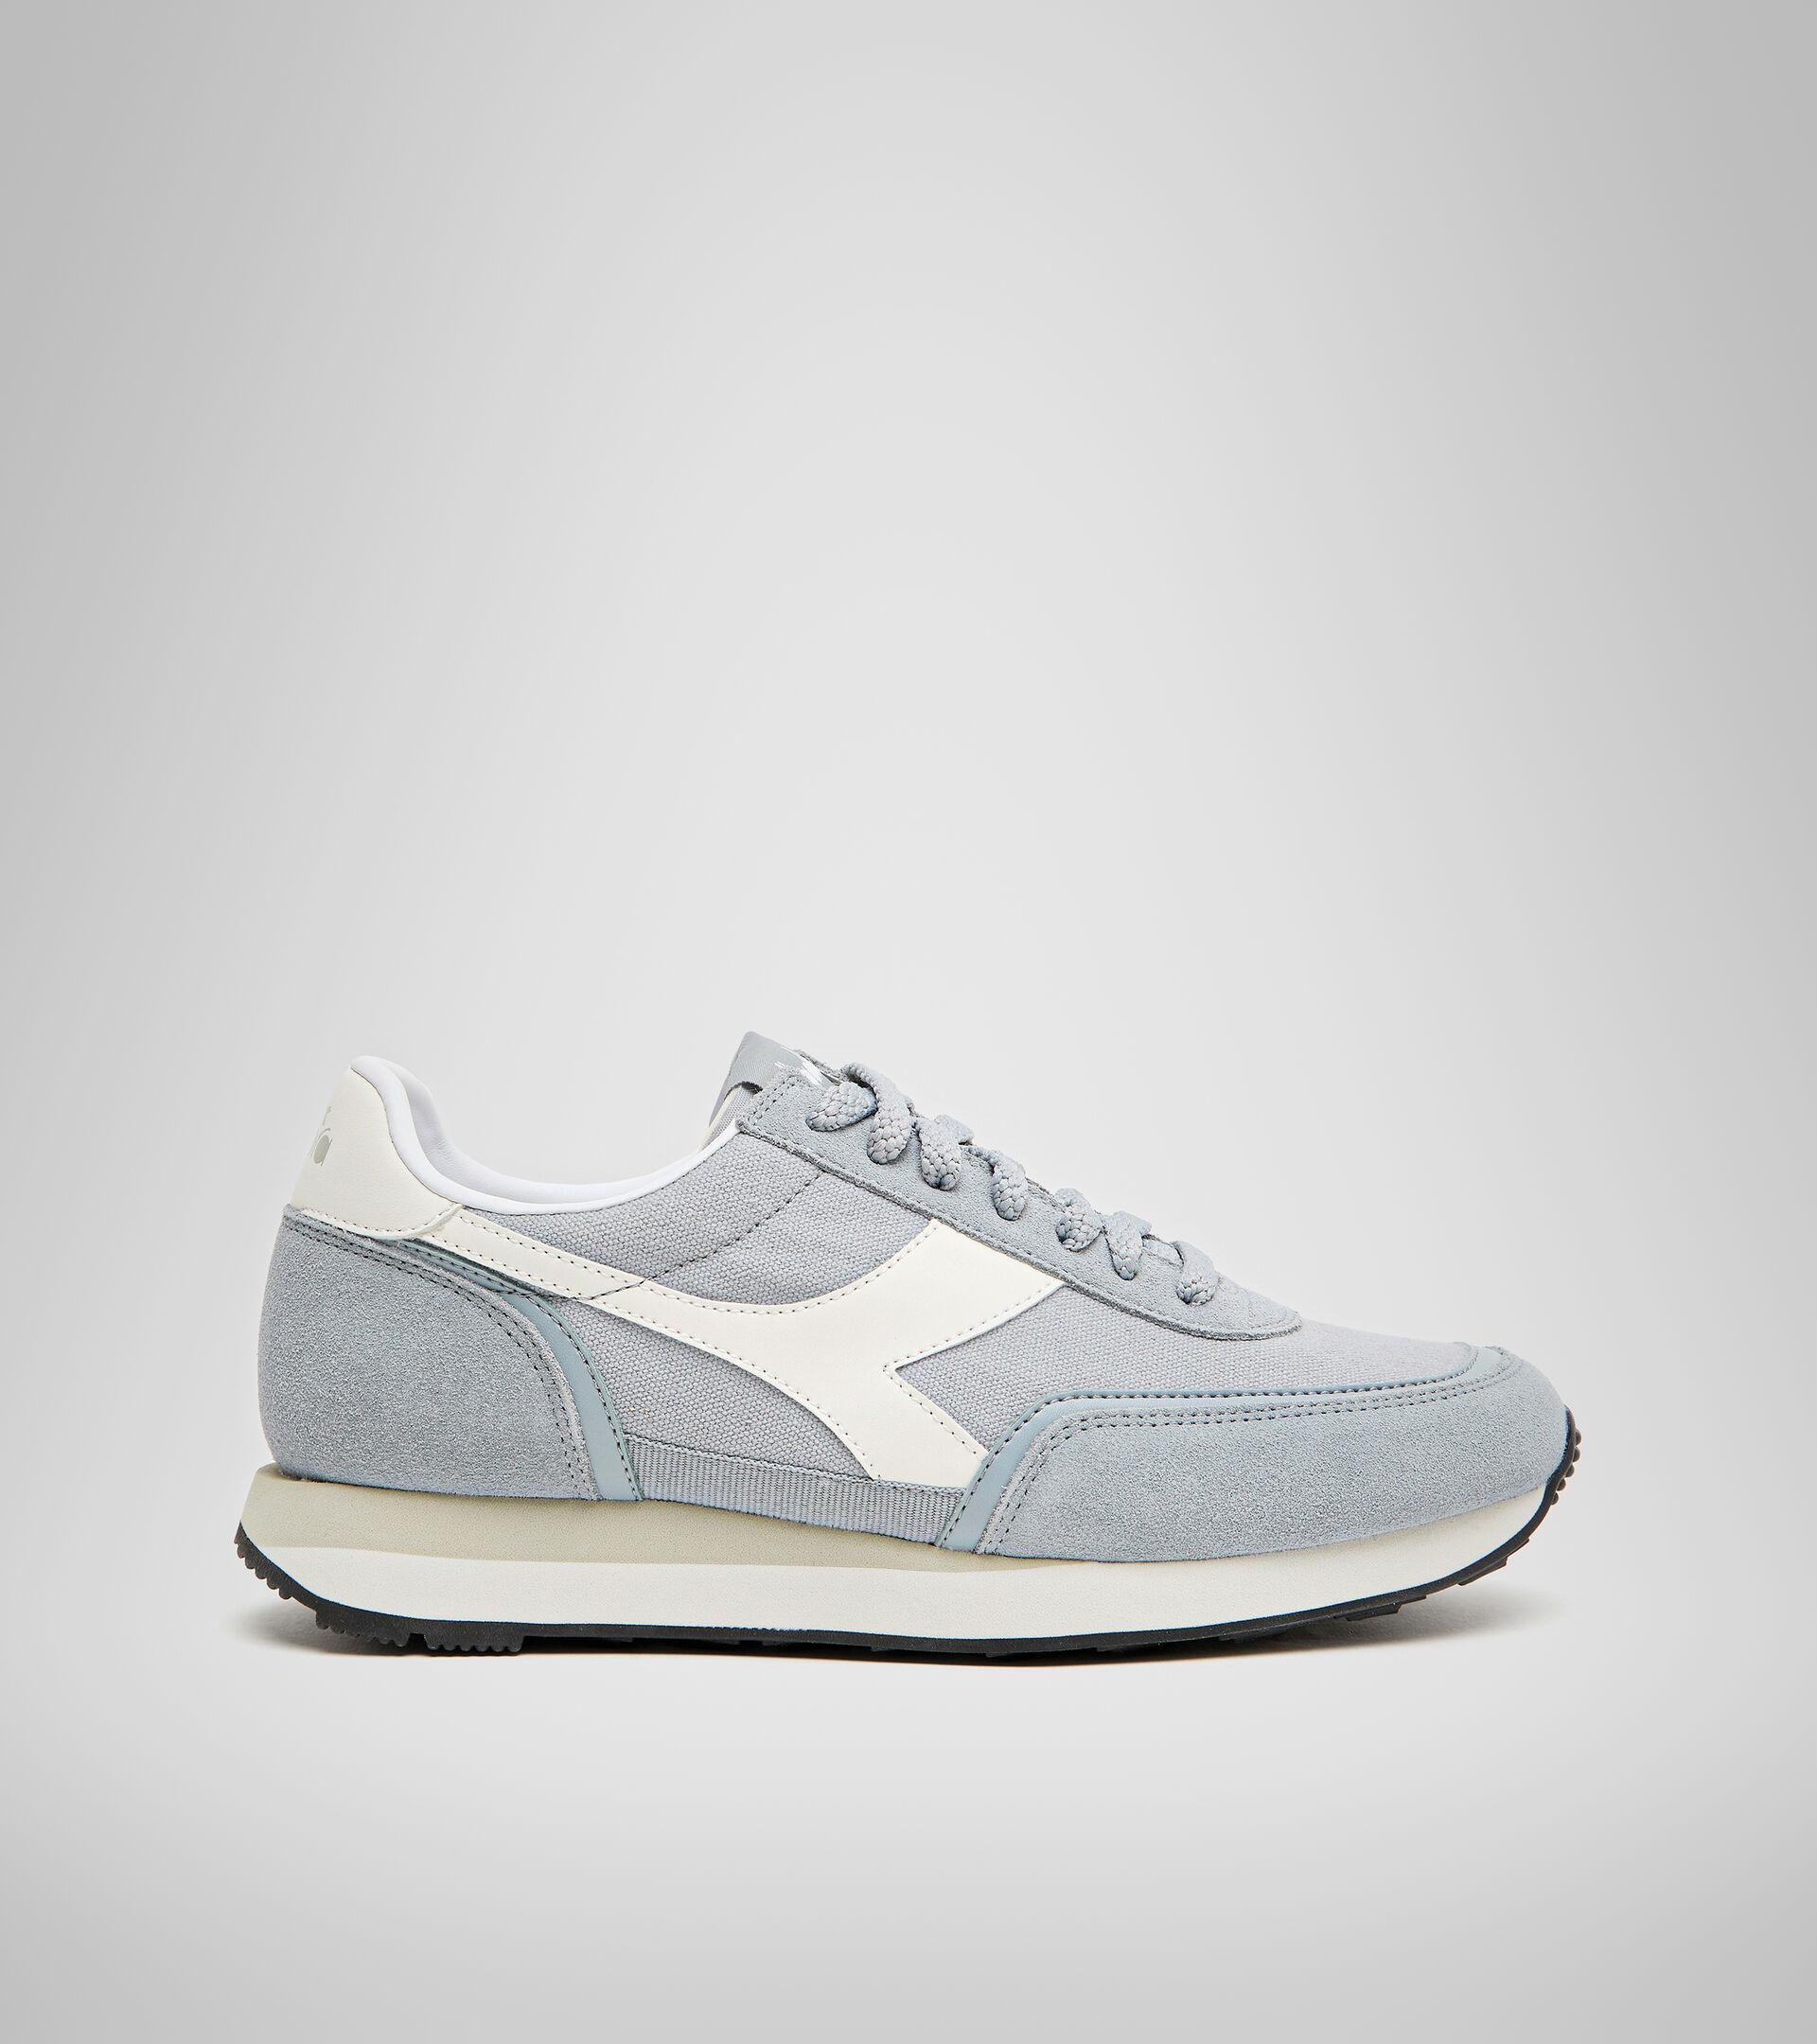 Footwear Sportswear DONNA KOALA REPLICANT WN CANTIERA/BLANCO MURMURAR Diadora